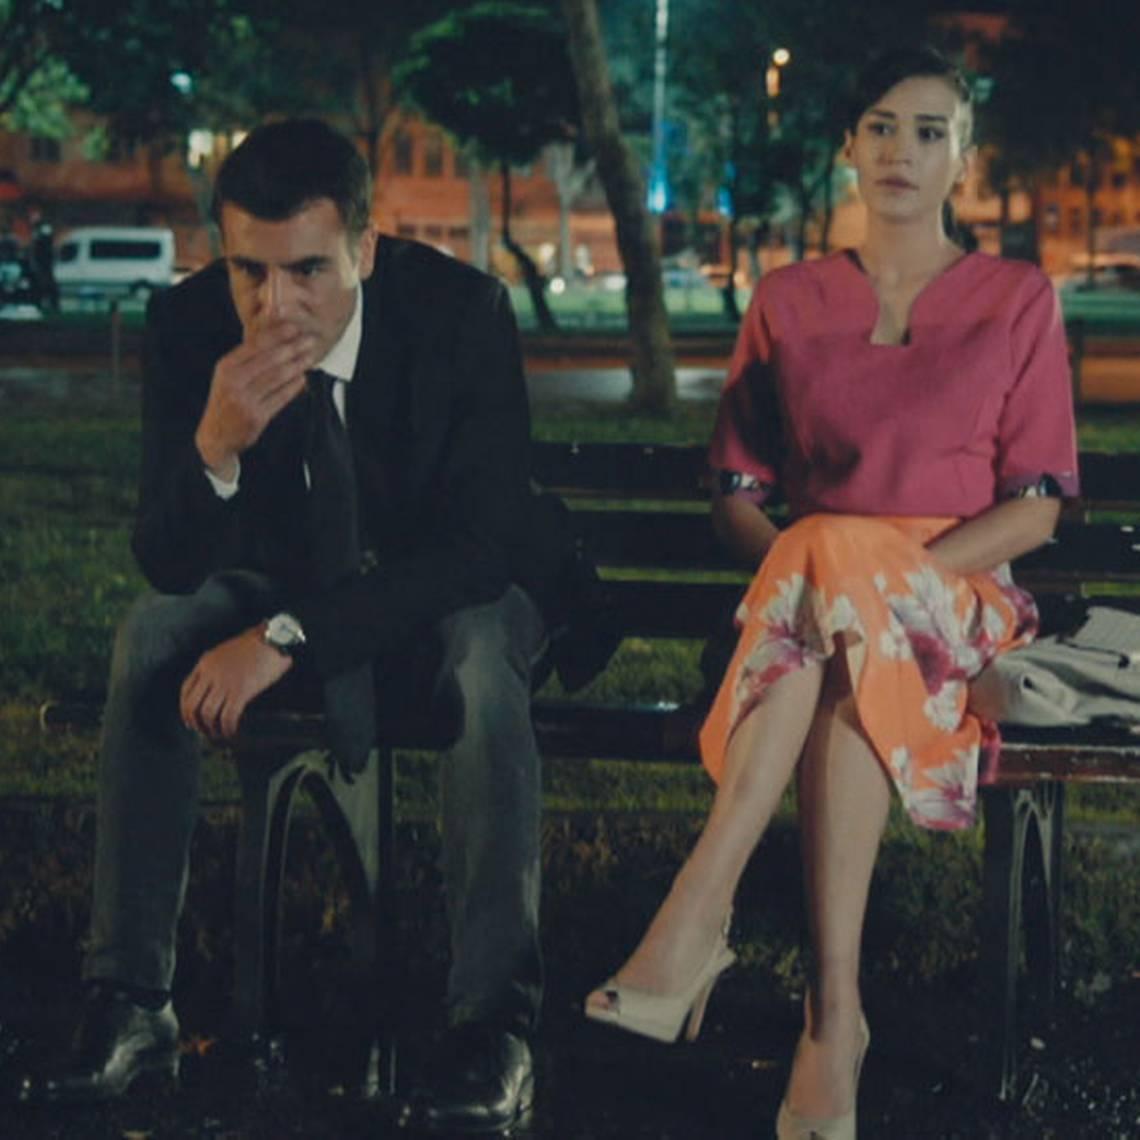 Hüseyin puso fin a su amor con Melek